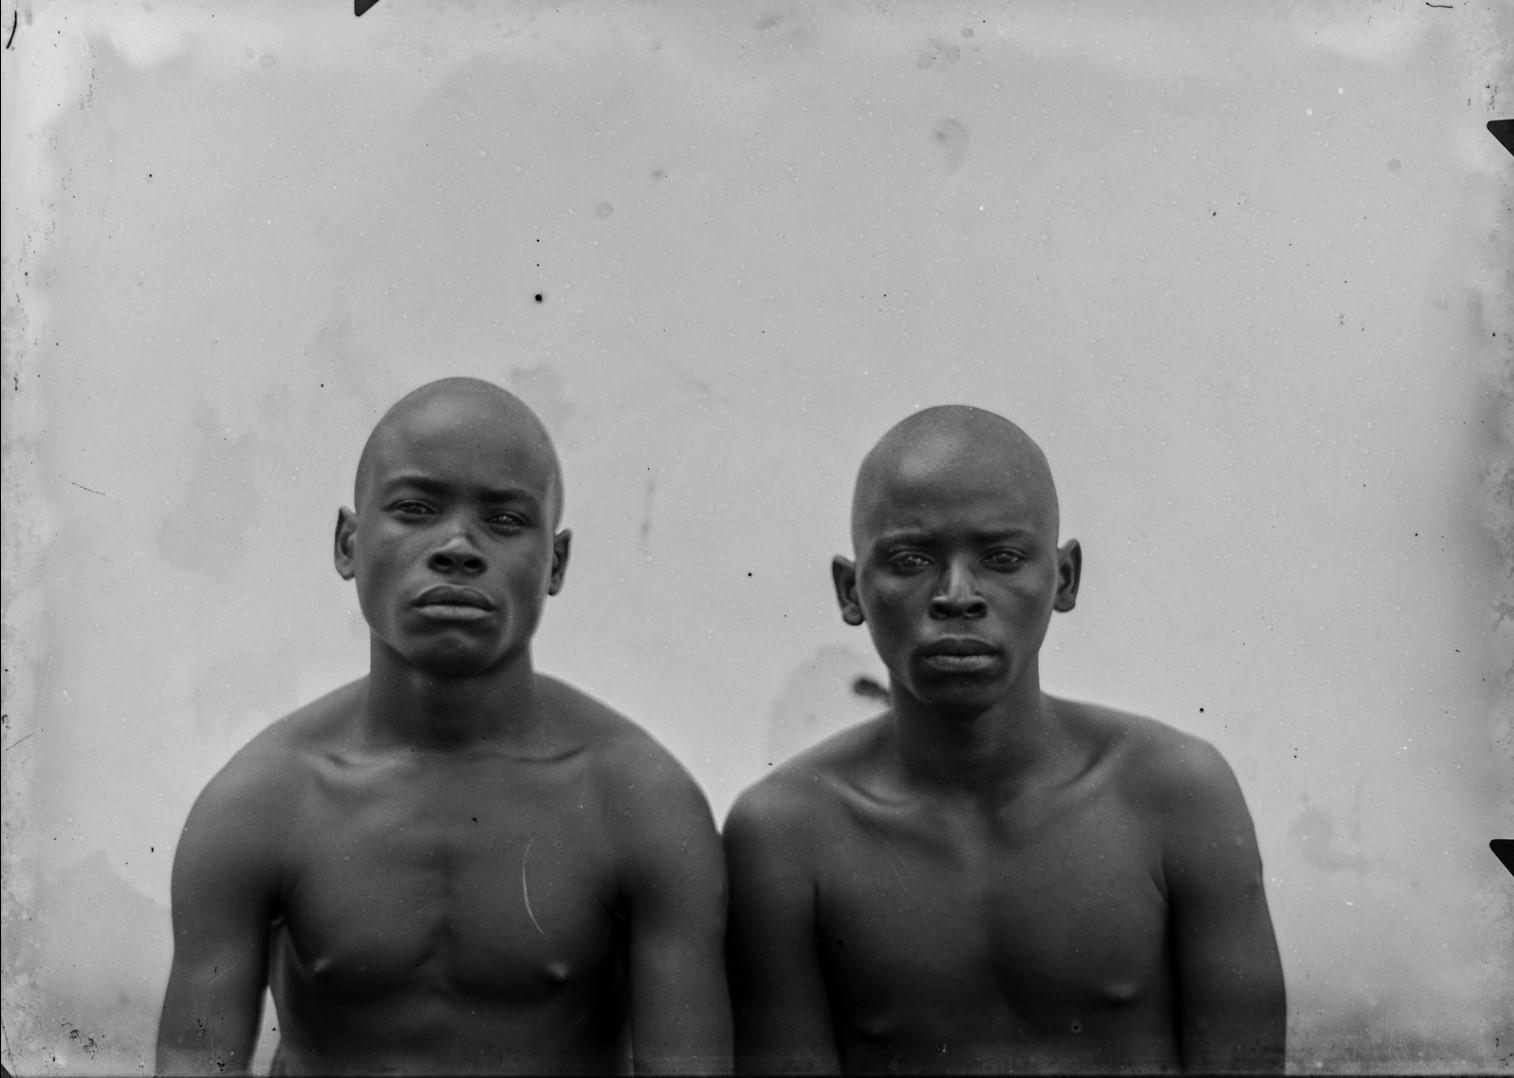 88. Портрет двух мужчин